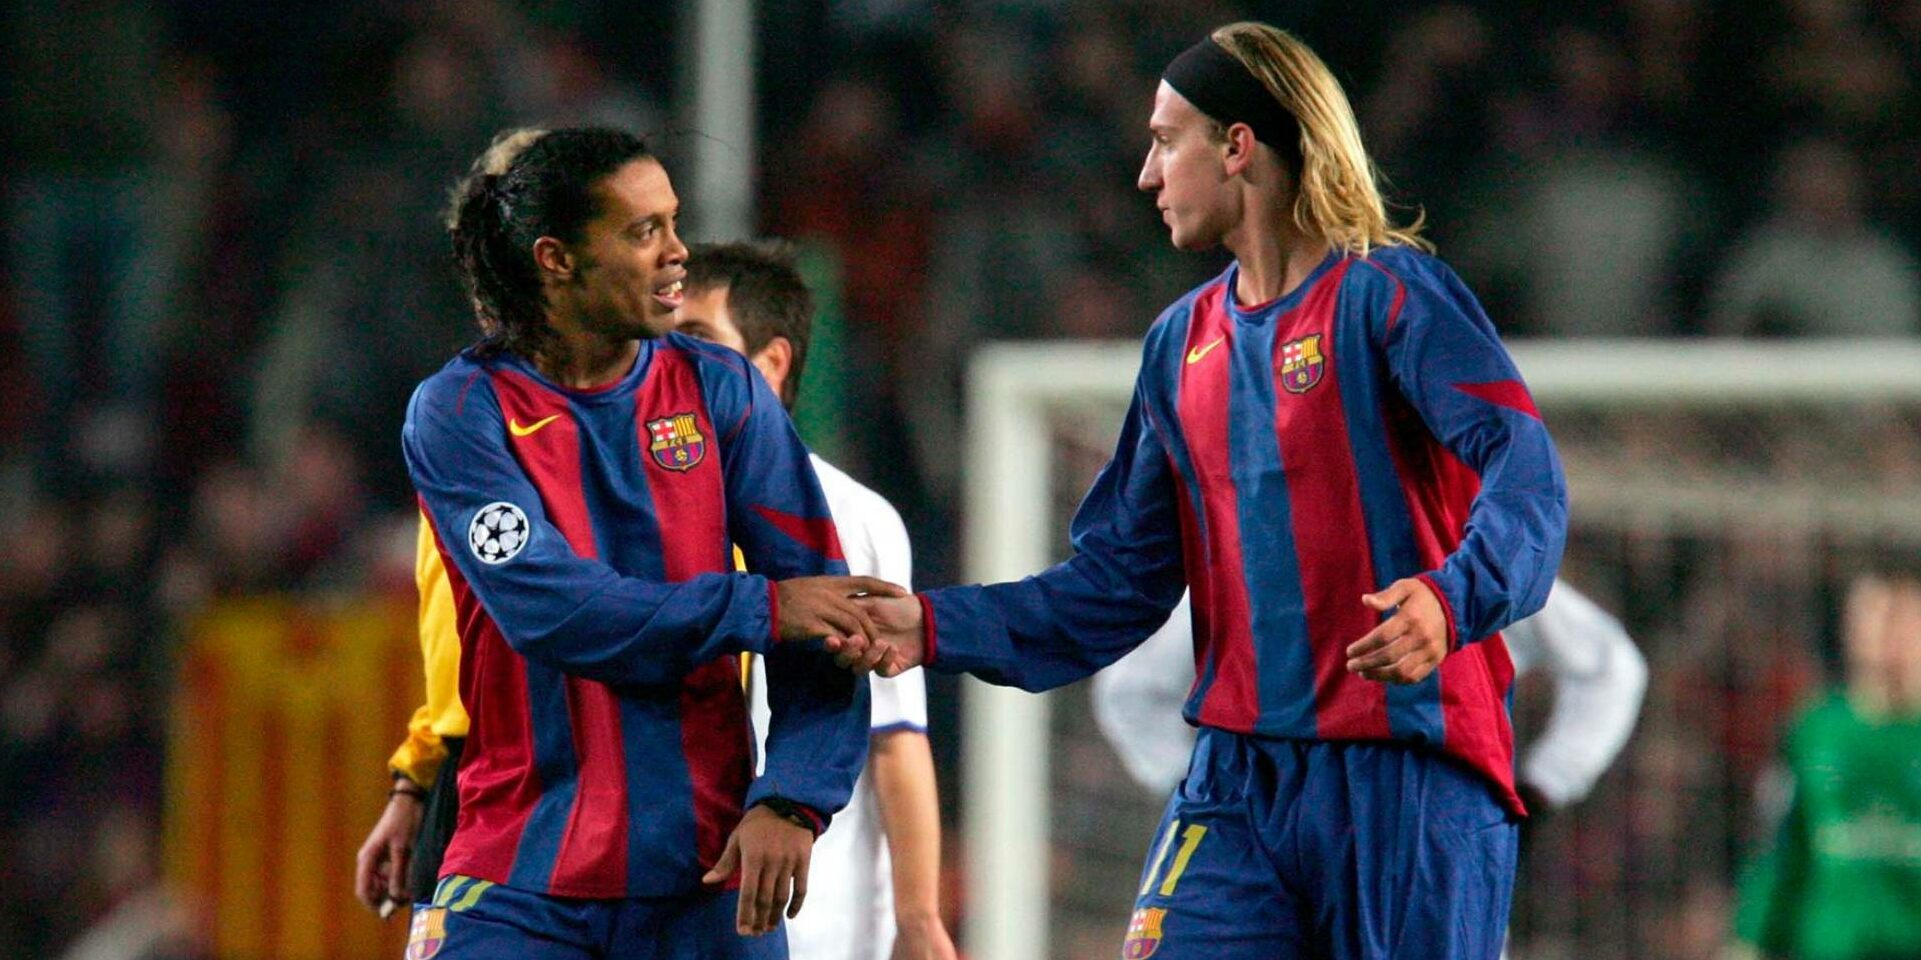 Maxi López i Ronaldinho, en arxiu   @MaxiLopez_11